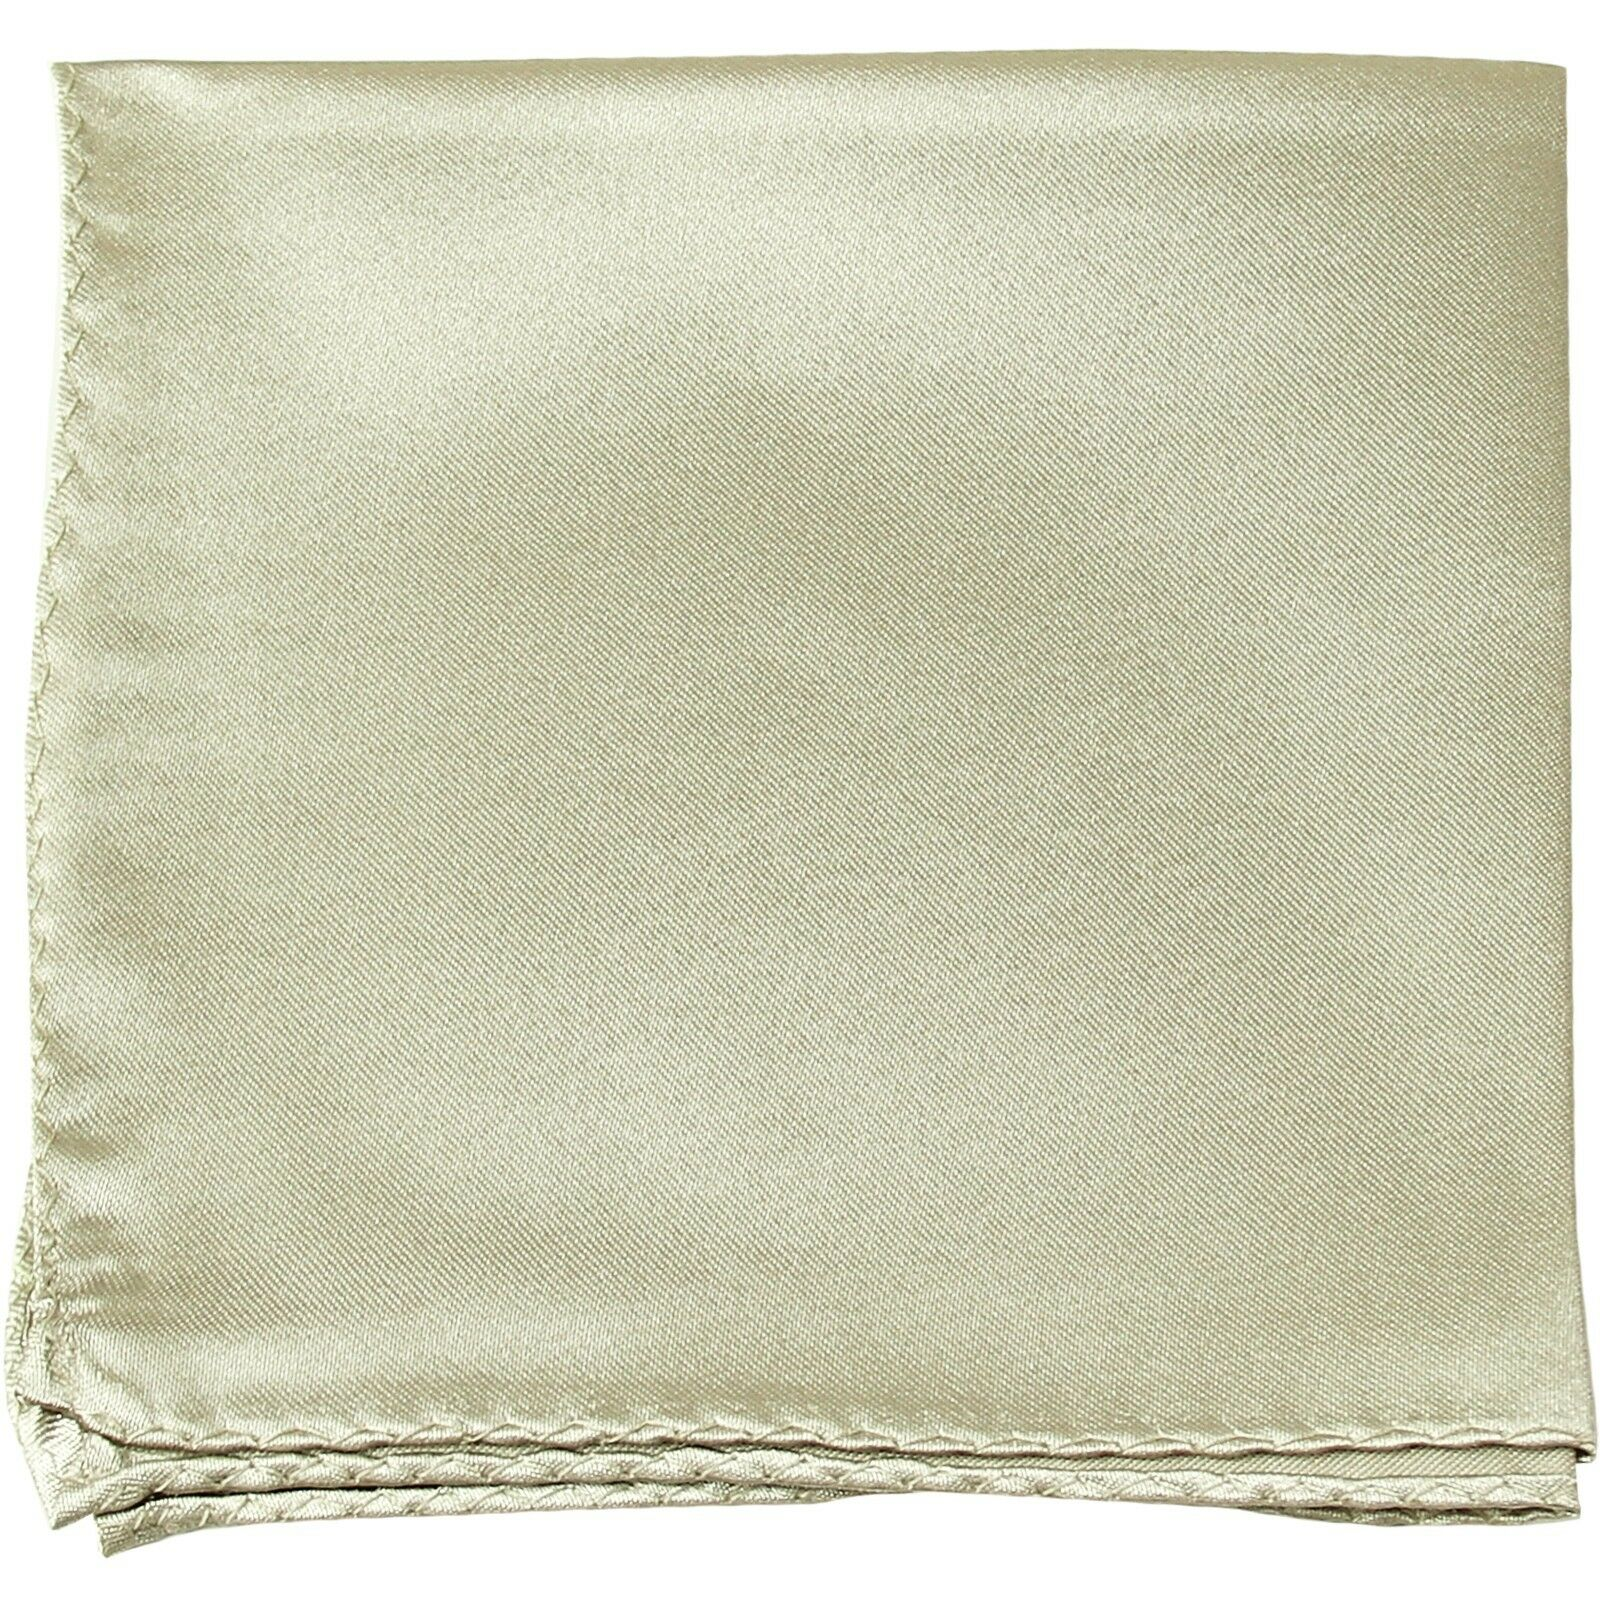 MANZO Men/'s Polyester Shiny Finish Pocket Square Hankie Only Purple Blue